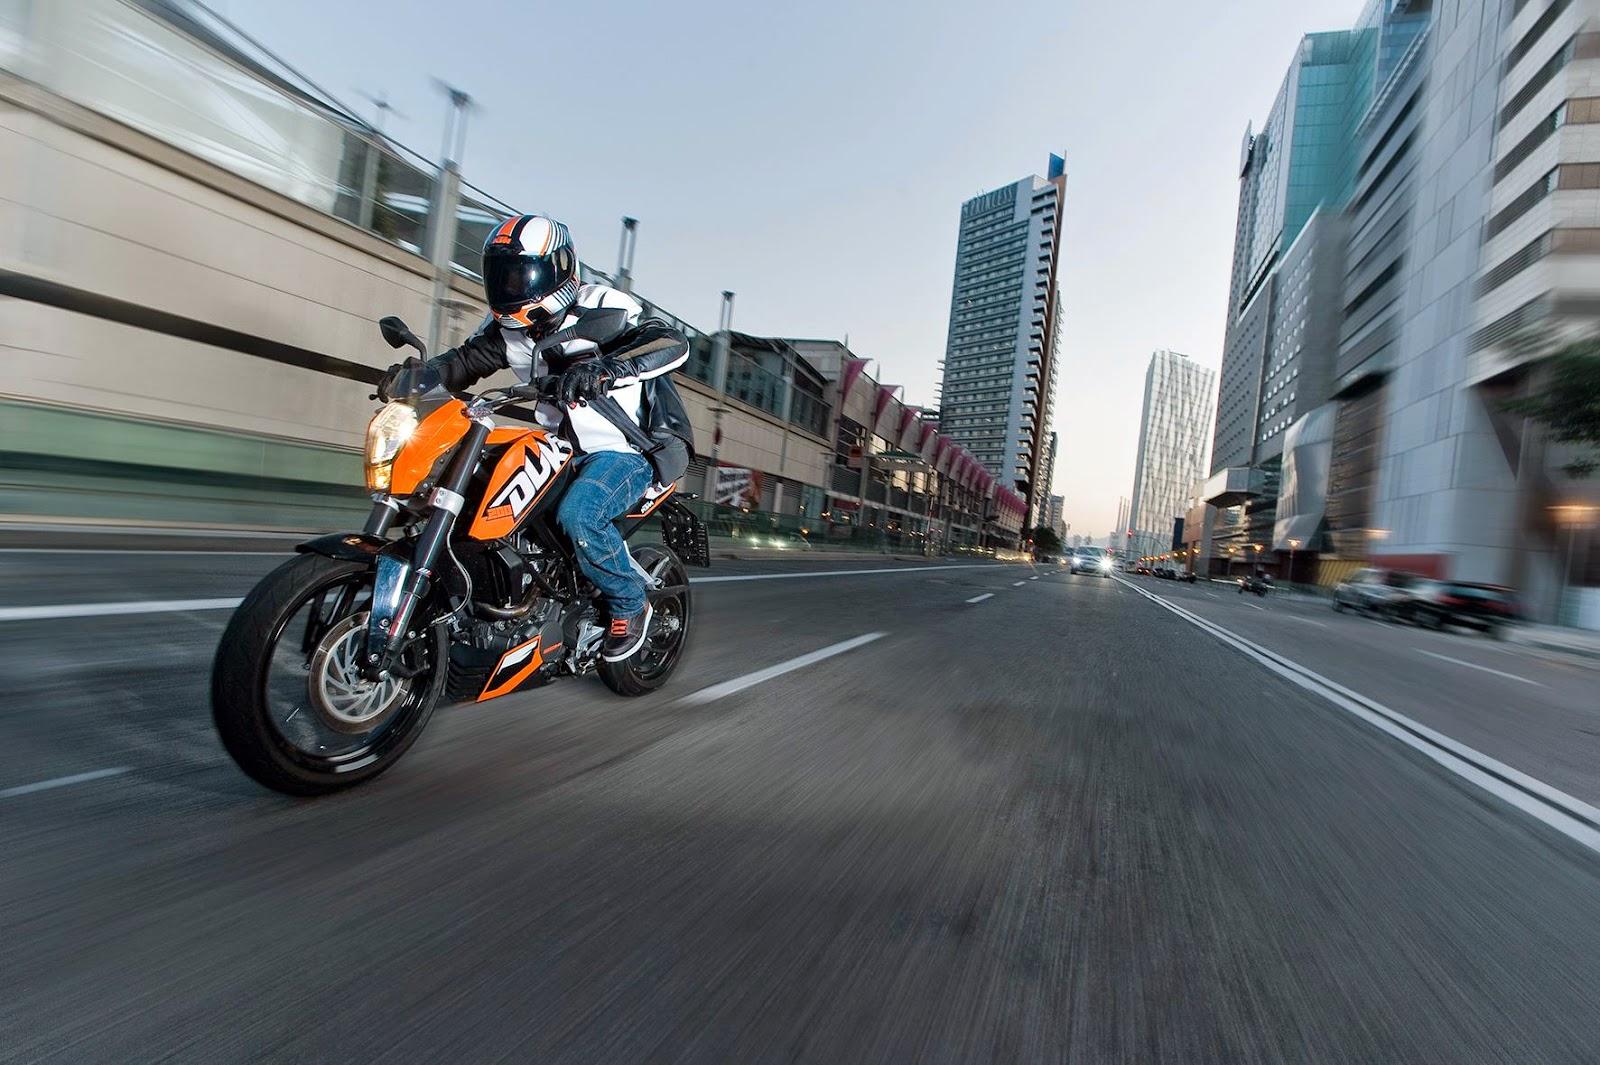 KTM Duke 200 (2014) Non ABS